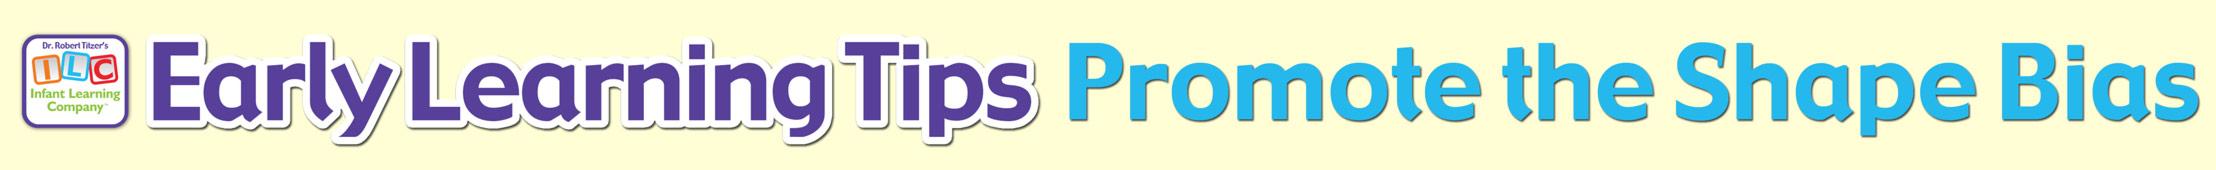 Promote the Shape Bias